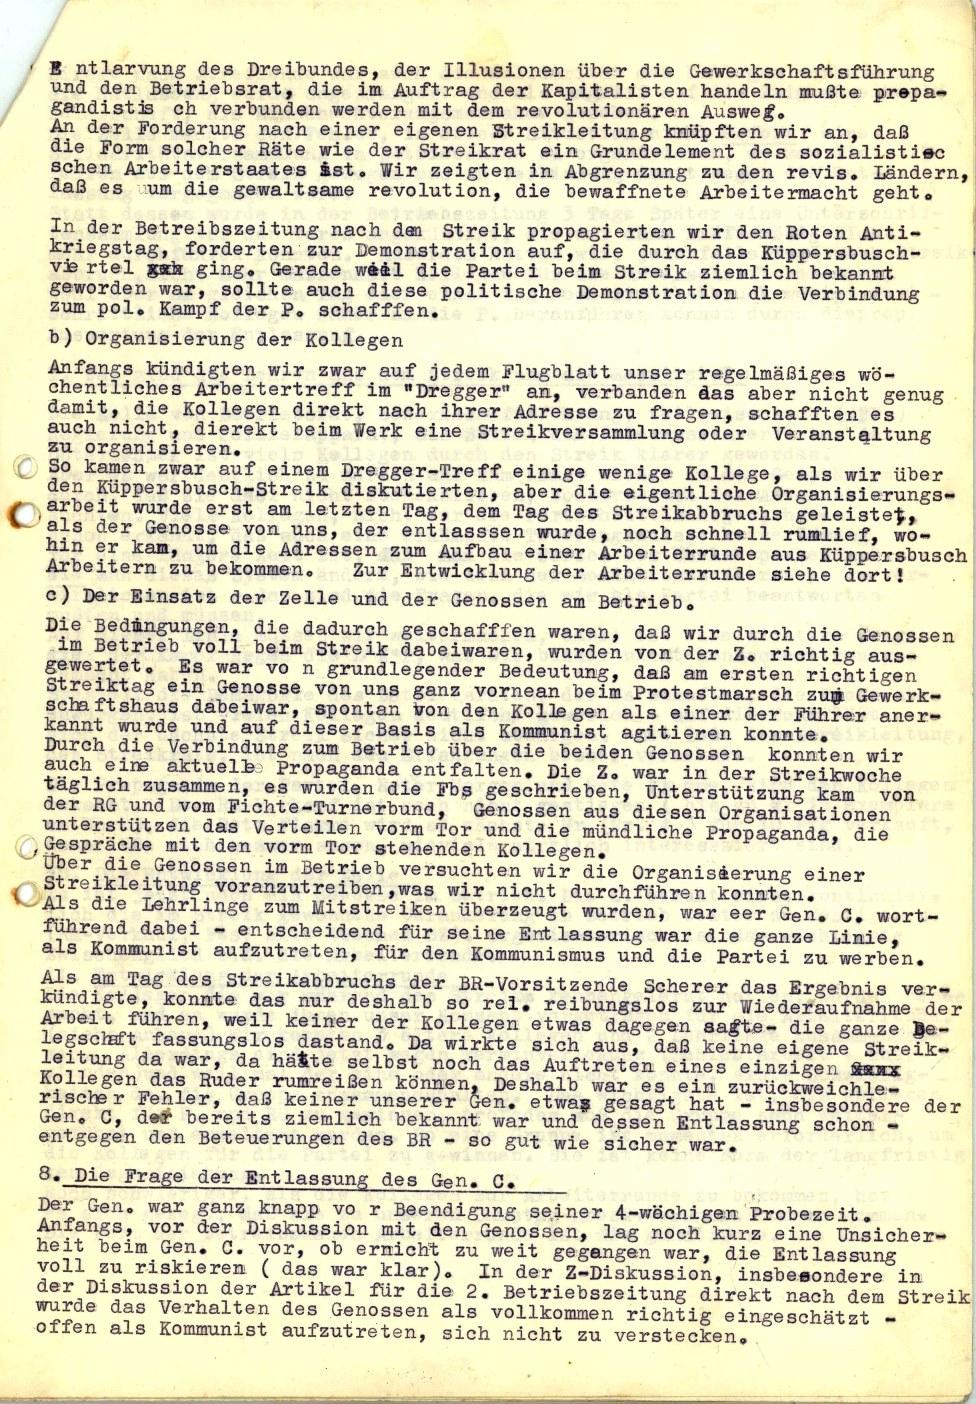 Streikbericht_KPD_ML_1973_03